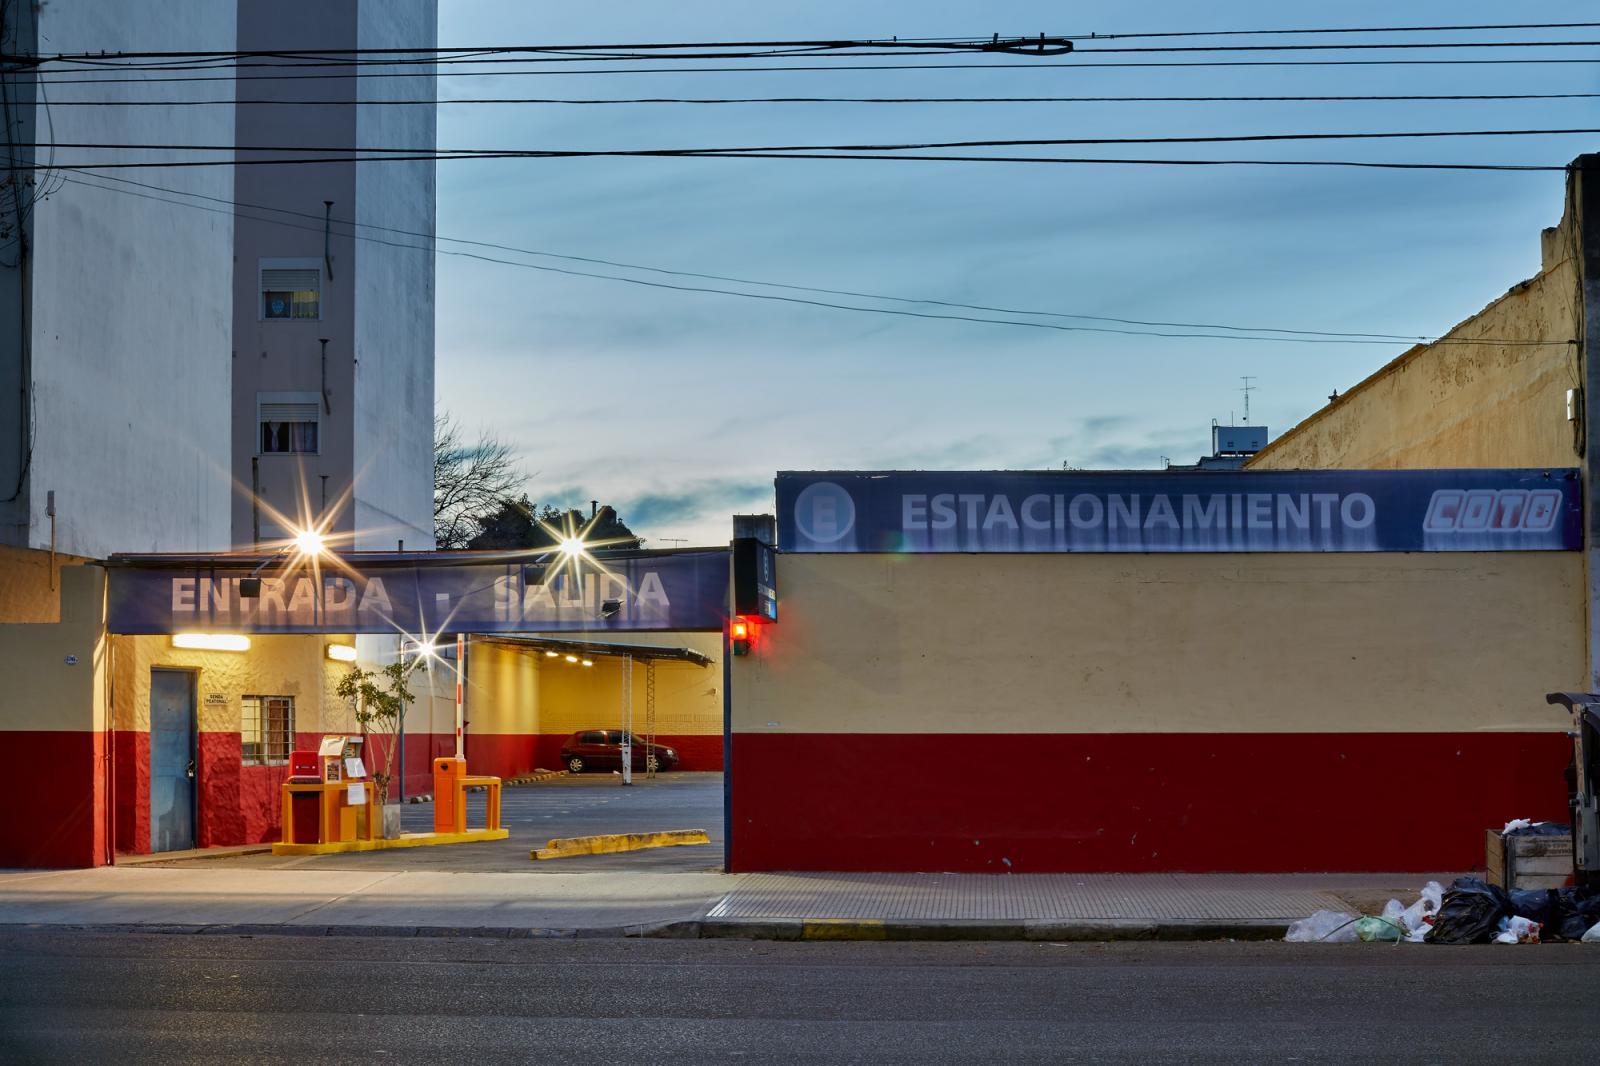 Photography image - Loading elelogio02.jpg